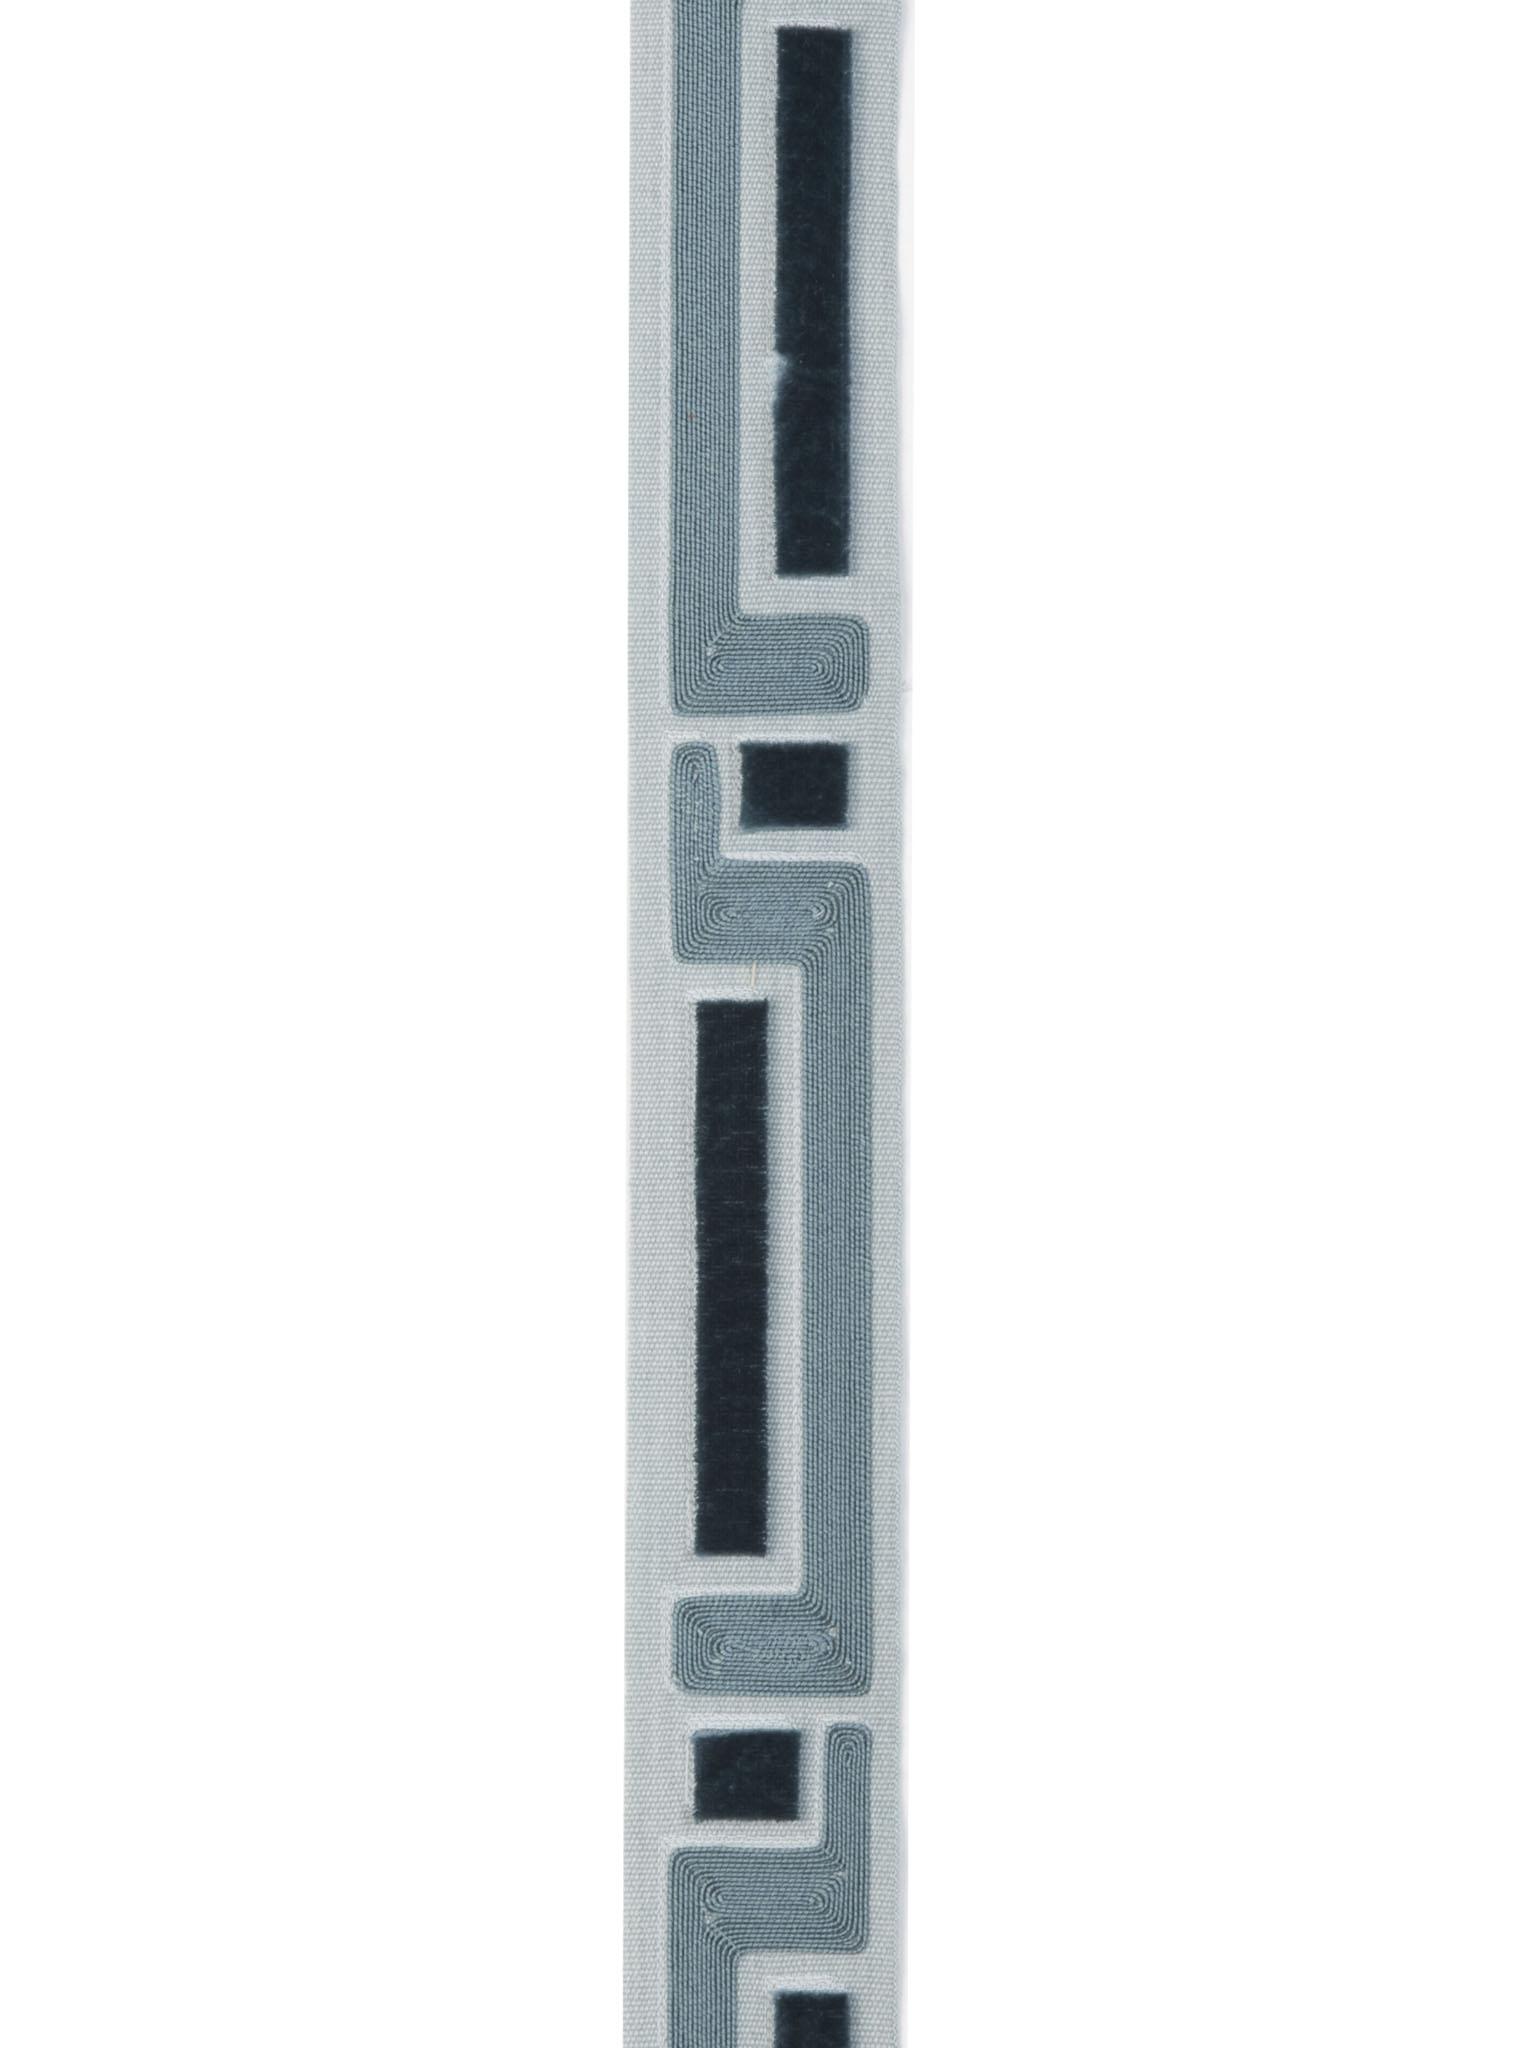 EMBTR159